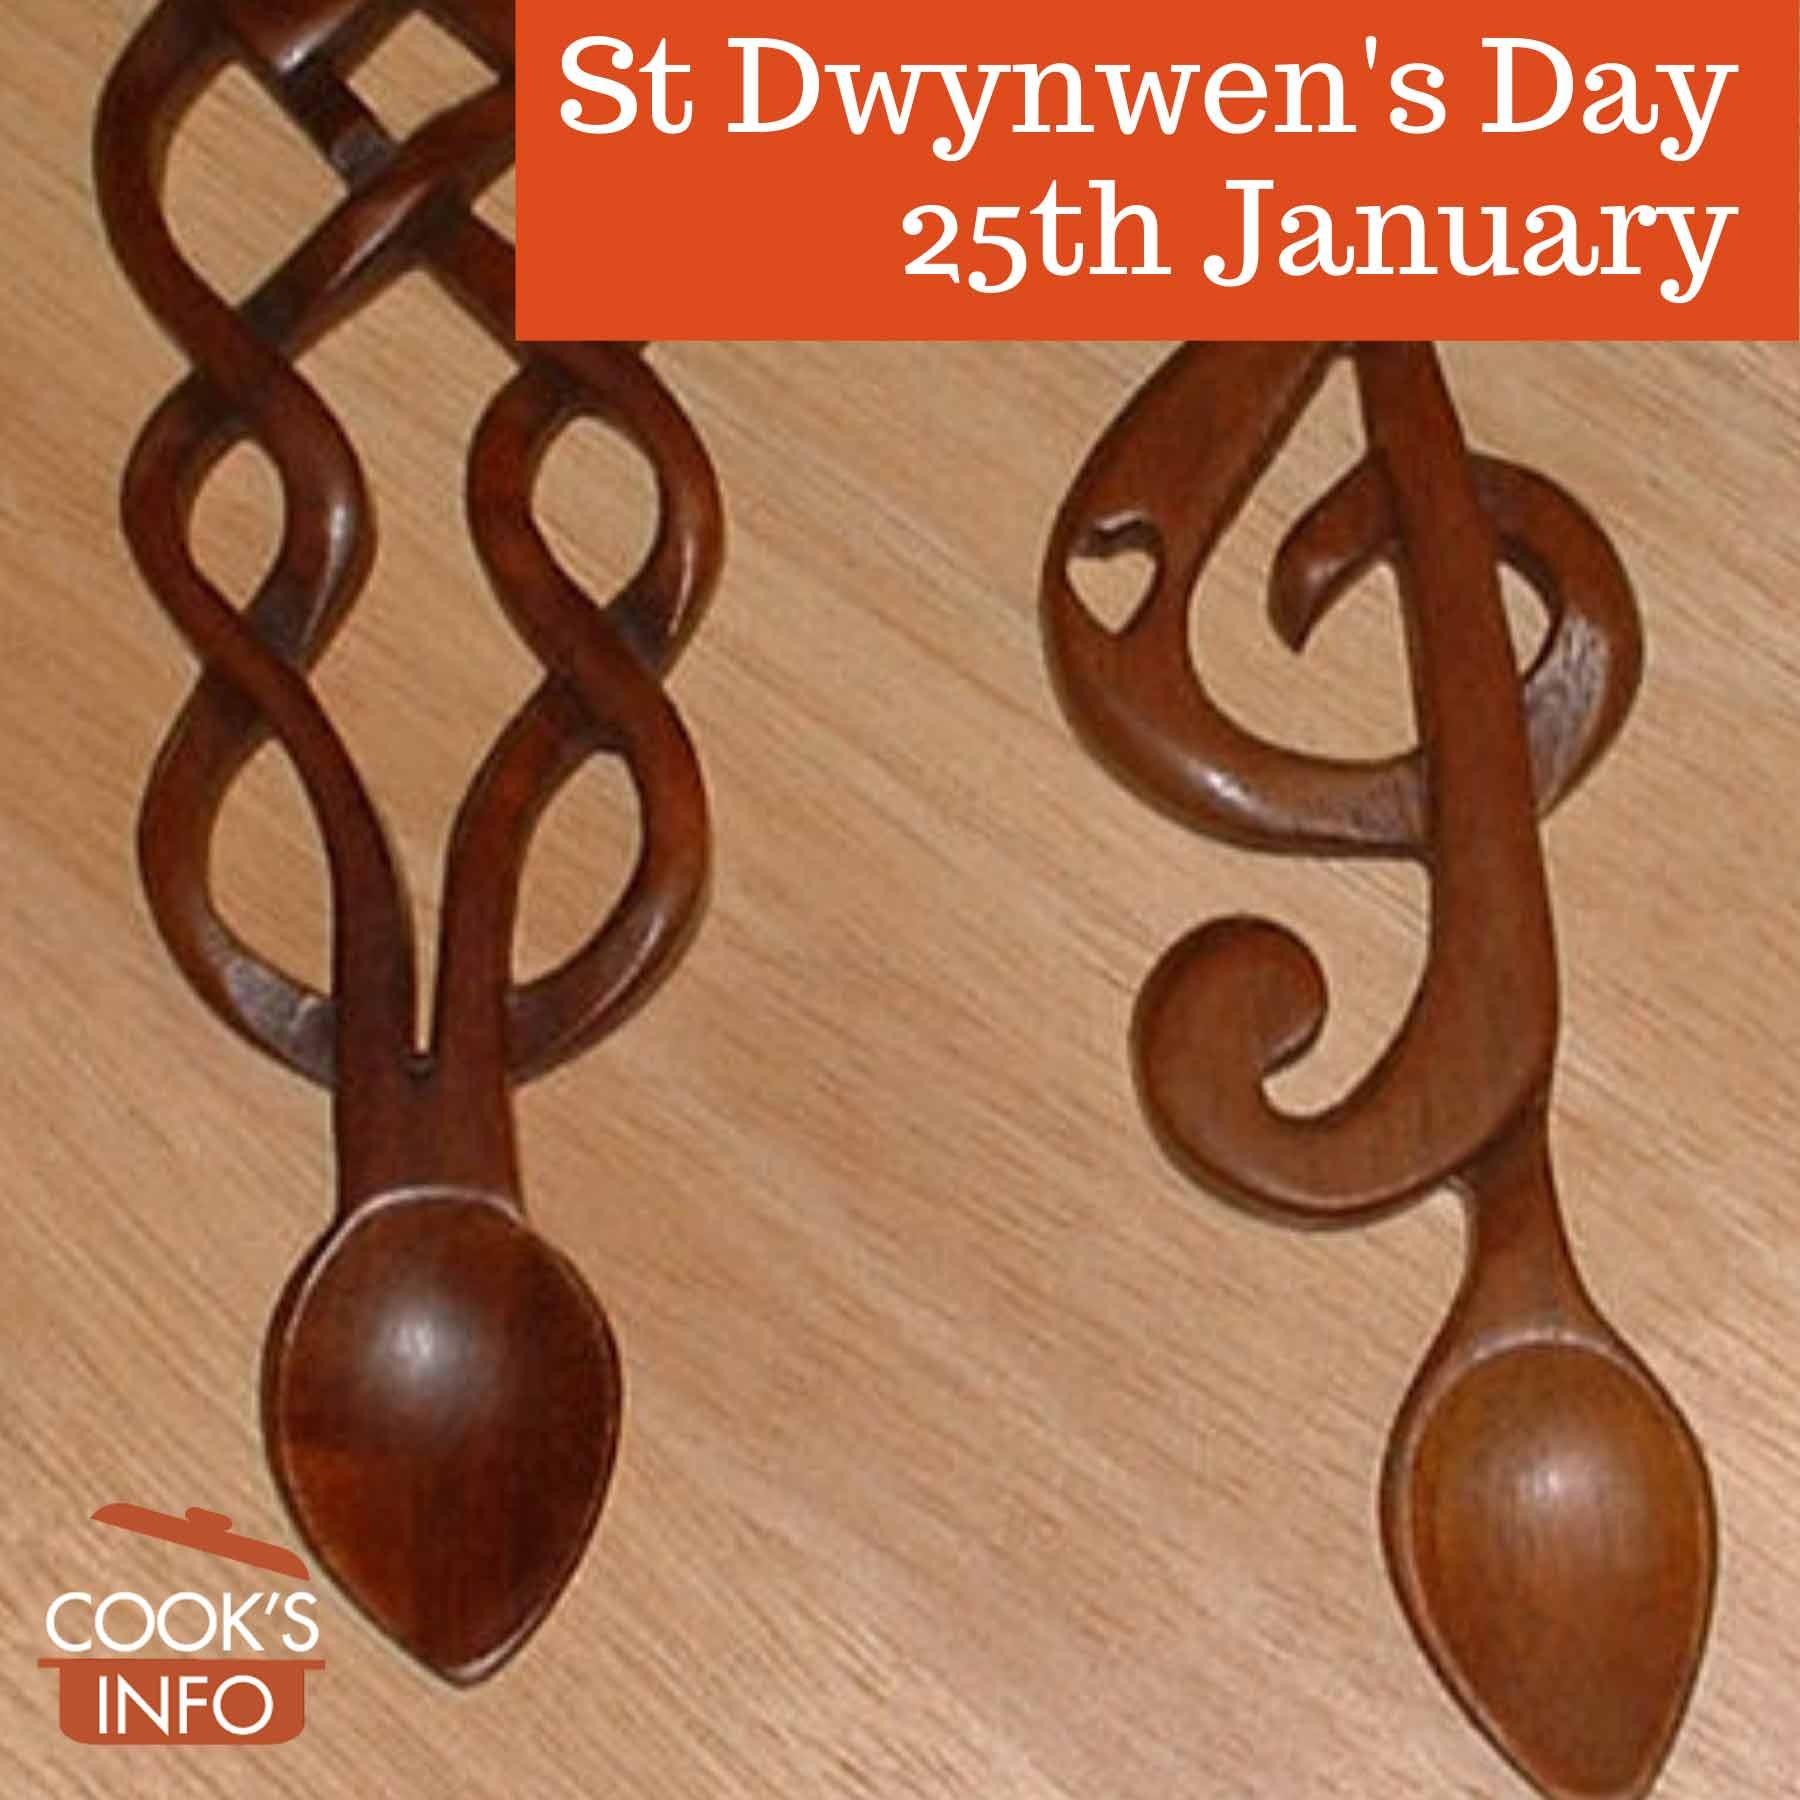 Welsh lovespoons